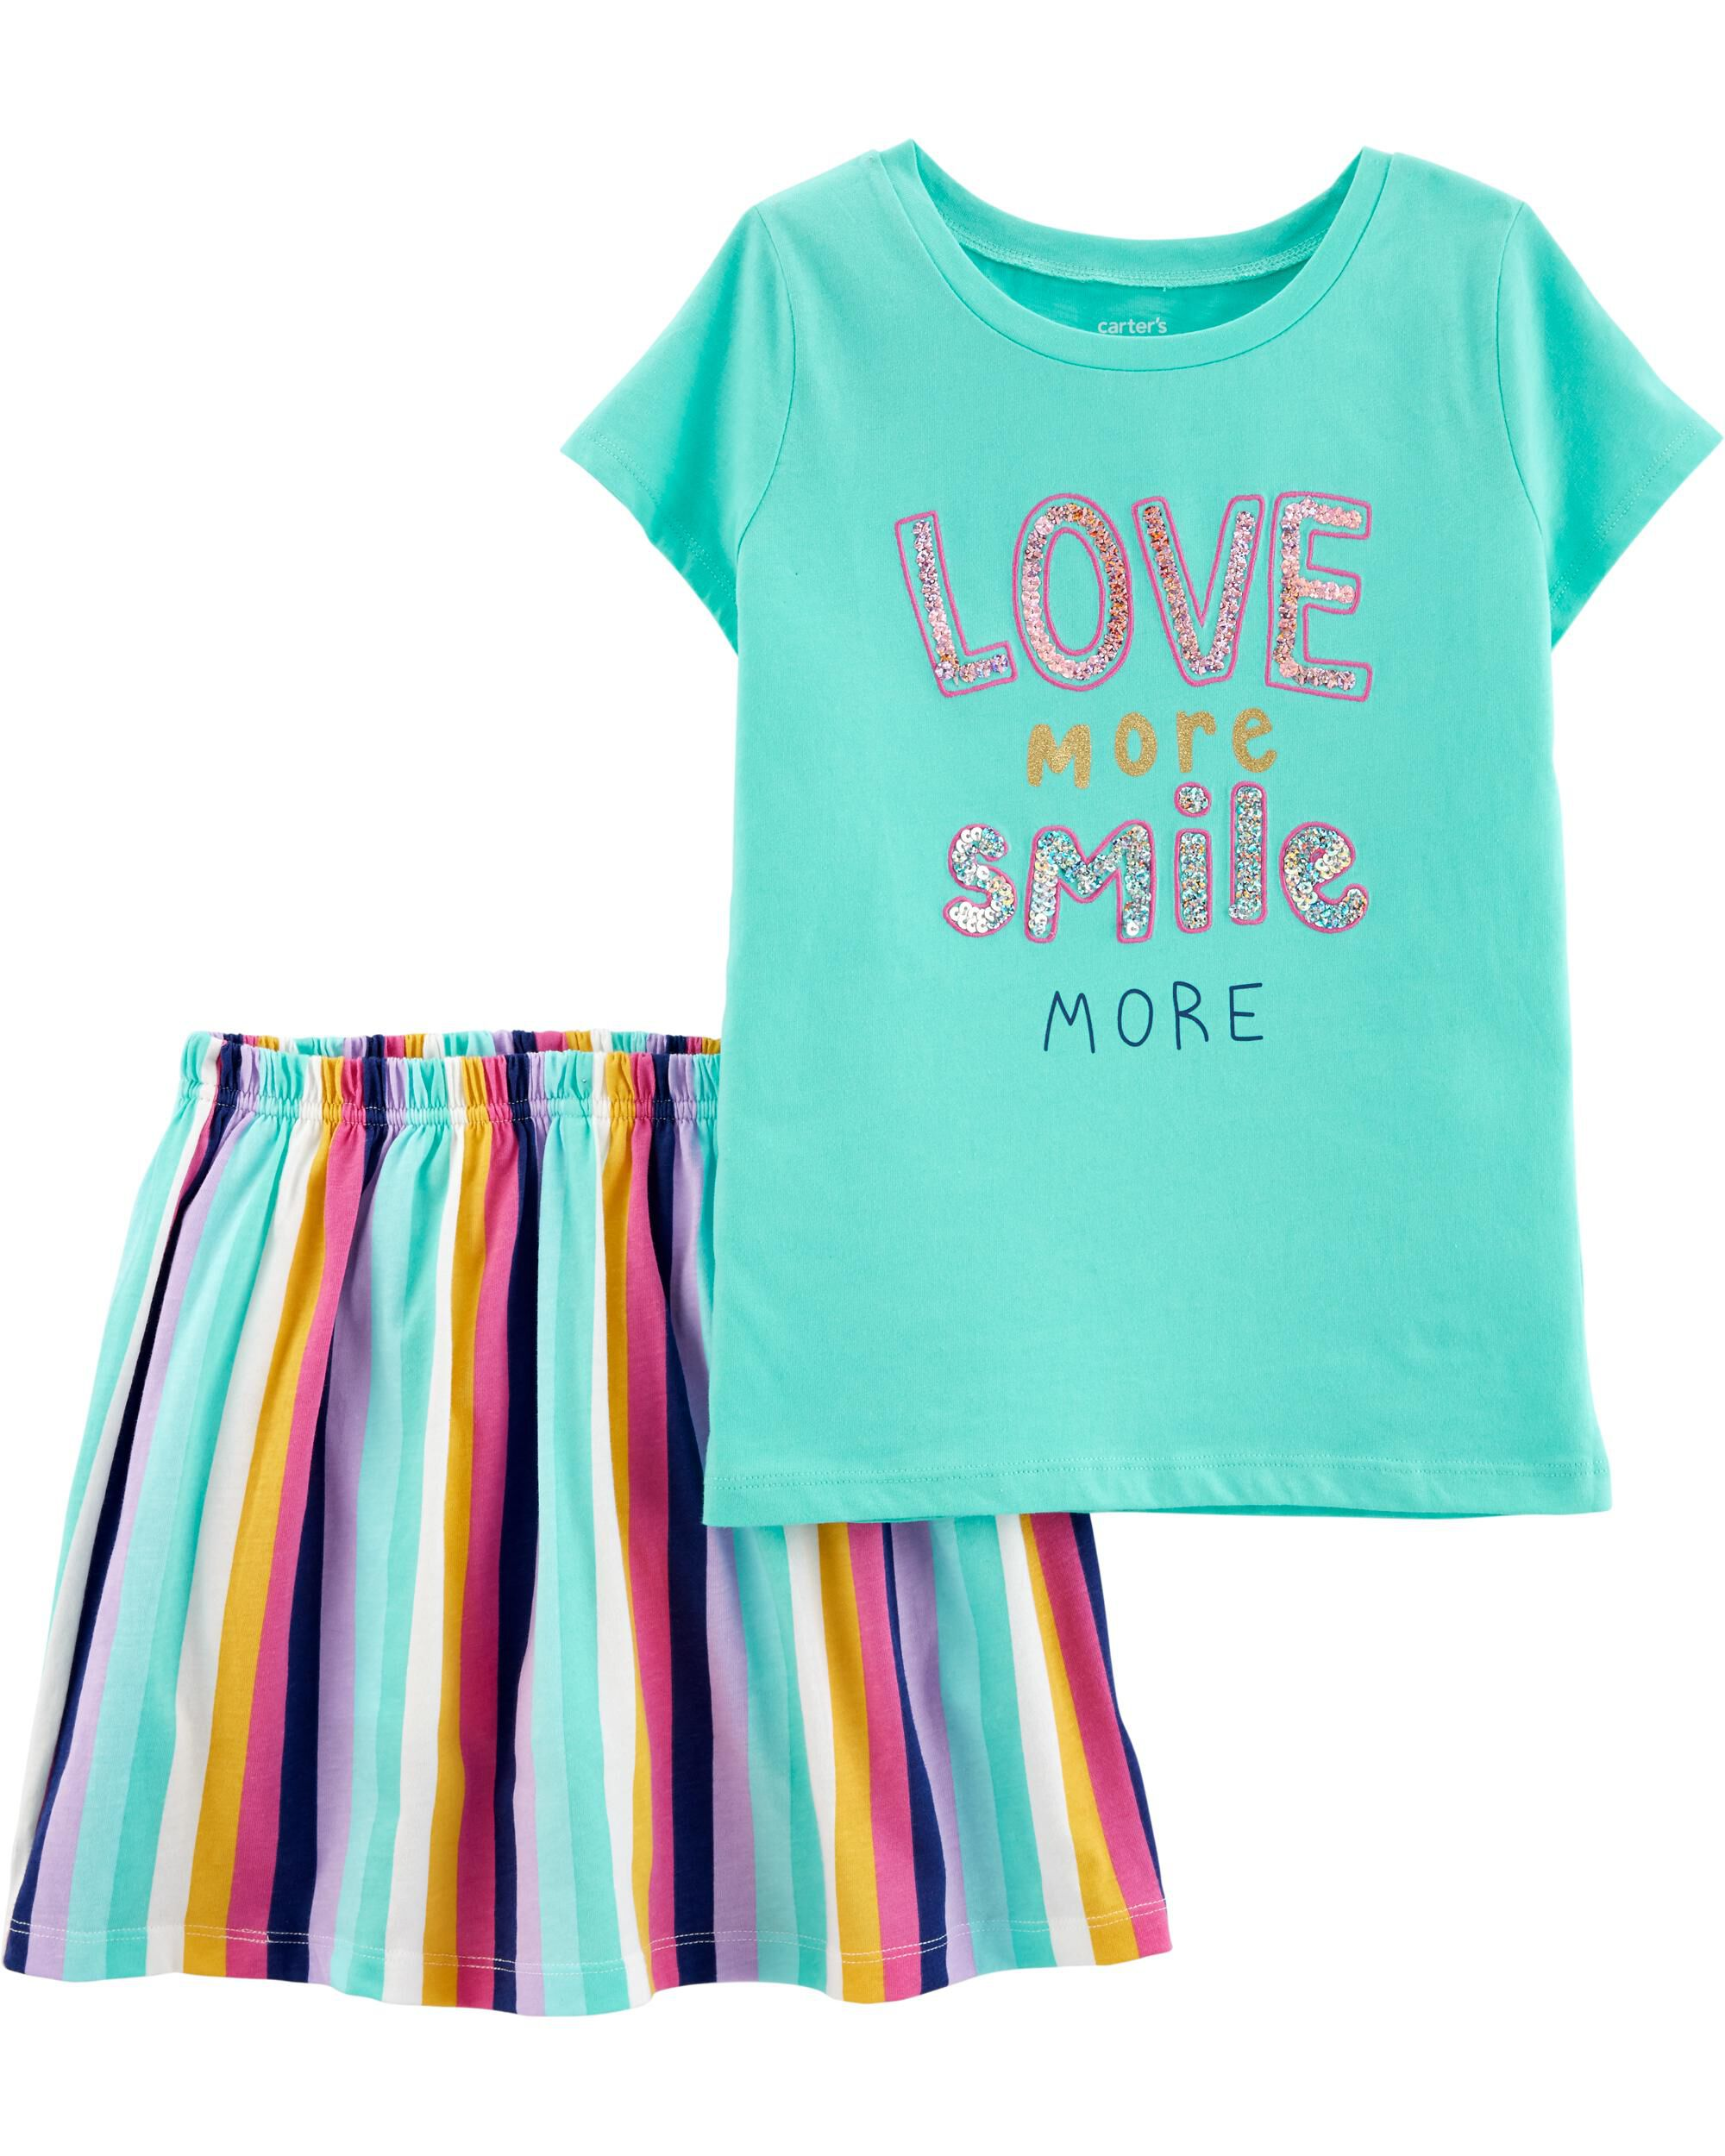 Tops & T-shirts Girls Carters Gray Short Sleeve Top 2t